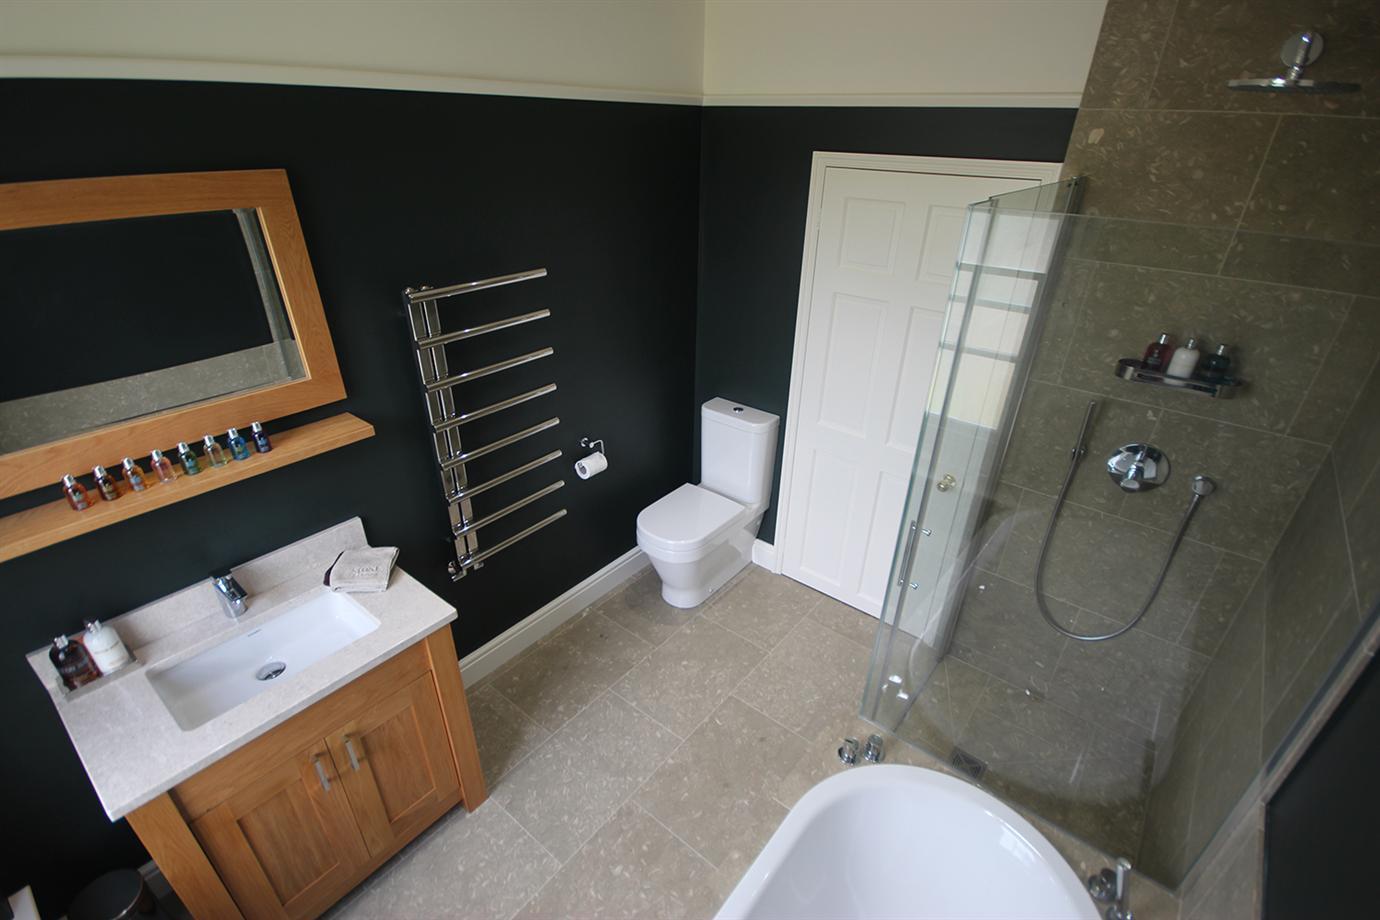 farrow ball studio green 93. Black Bedroom Furniture Sets. Home Design Ideas